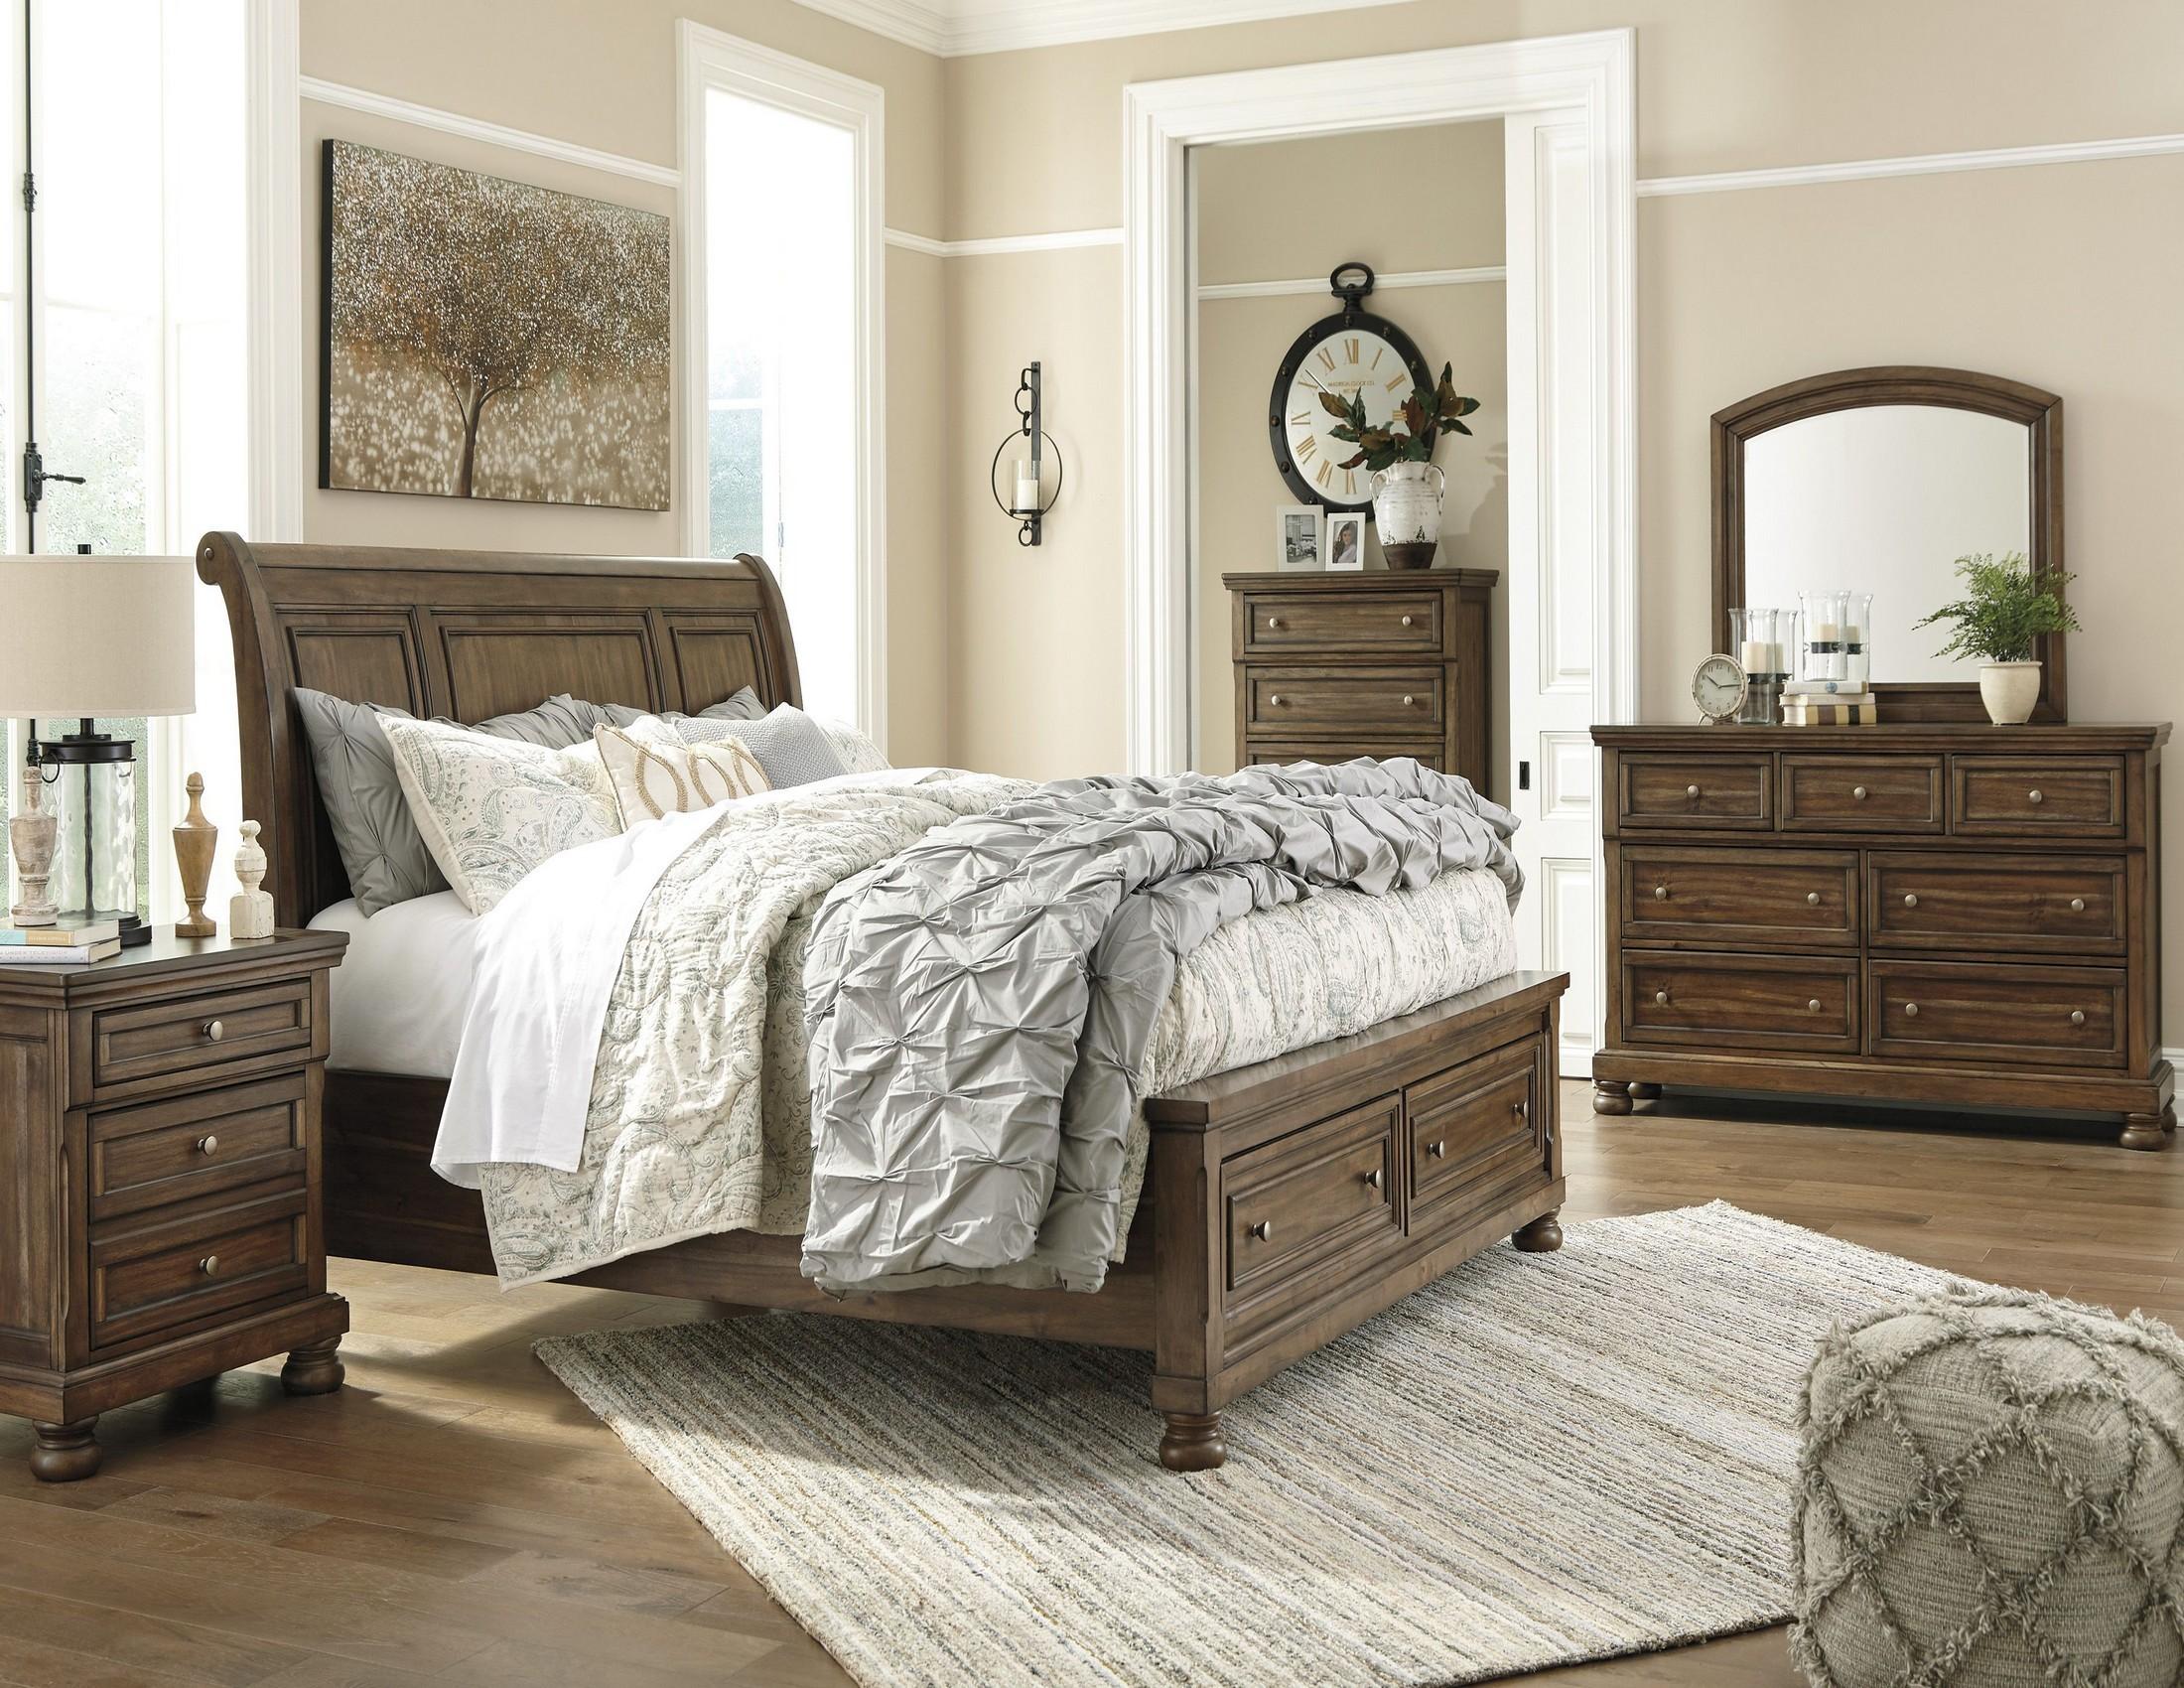 Flynnter Porter Medium Brown Sleigh Storage Bedroom Set Media Gallery